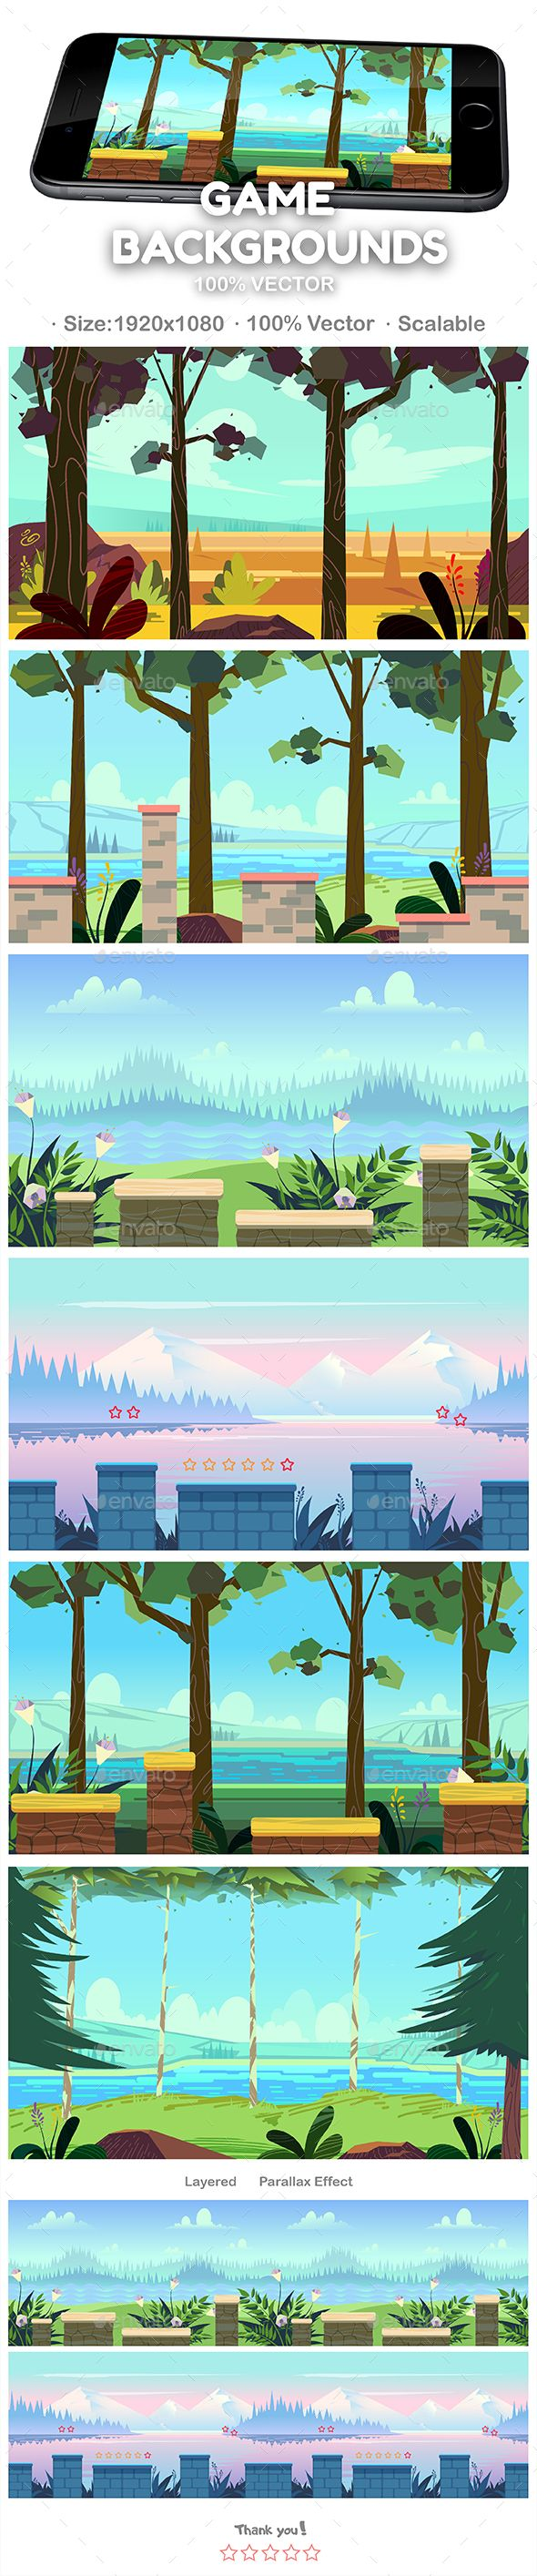 #Game #Backgrounds #Set #template - Backgrounds Game #Assets #design #ui #ux #gui. download: https://graphicriver.net/item/game-backgrounds-set/20352944?ref=yinkira